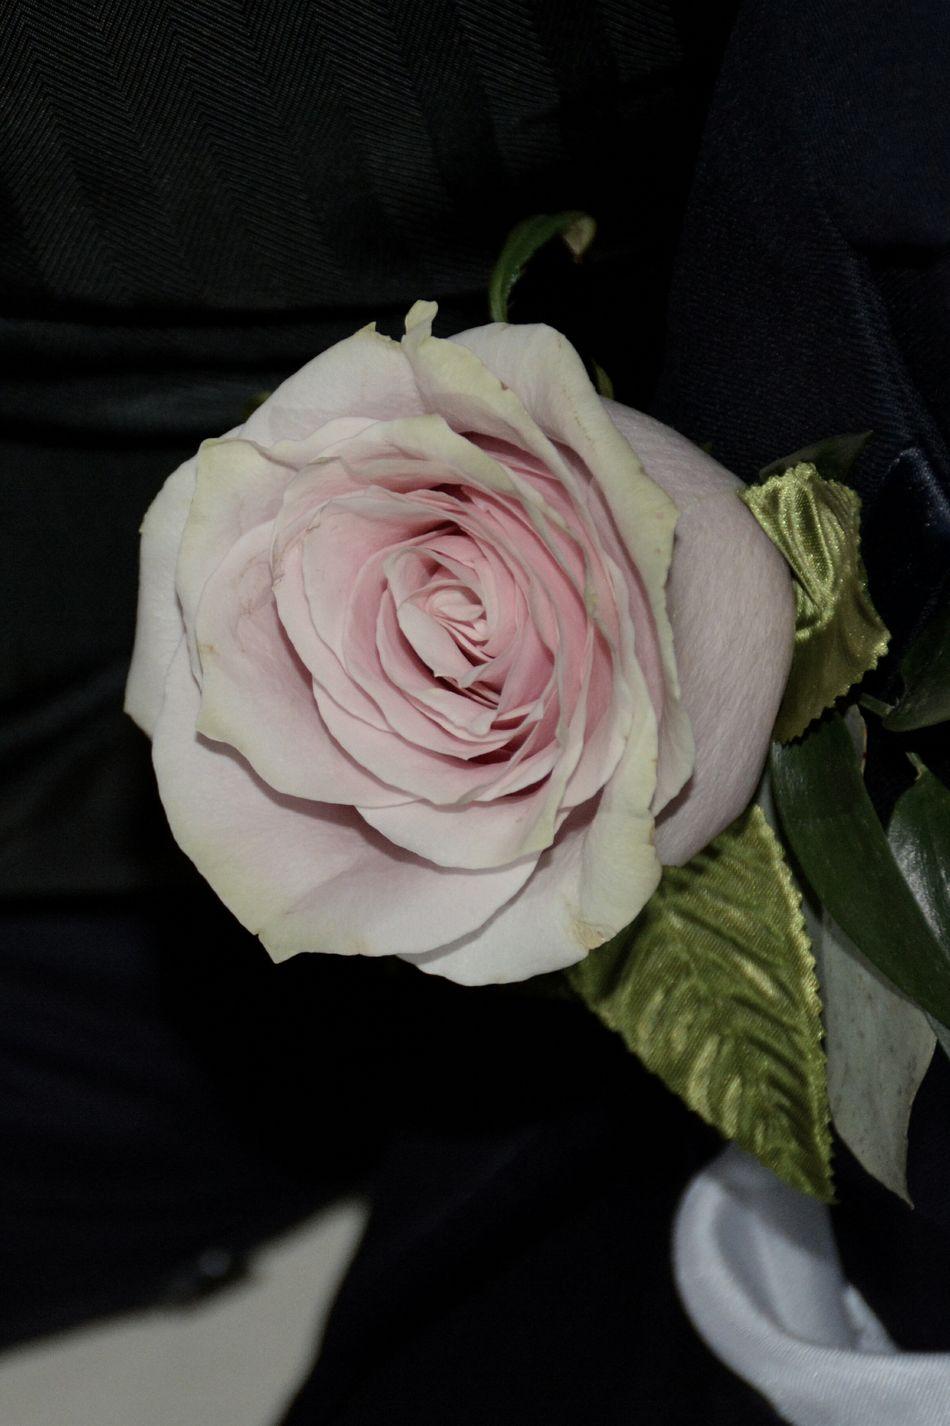 pink rose boutonniere Flower Rose - Flower Close-up Fragility Flower Head Black Background Pink Color Pink Full Frame Boutonniere Boutonniere Flower Wedding Groomsmen Groomsman Wedding Detail Bestman Best Man Wedding Flower Wedding Flowers